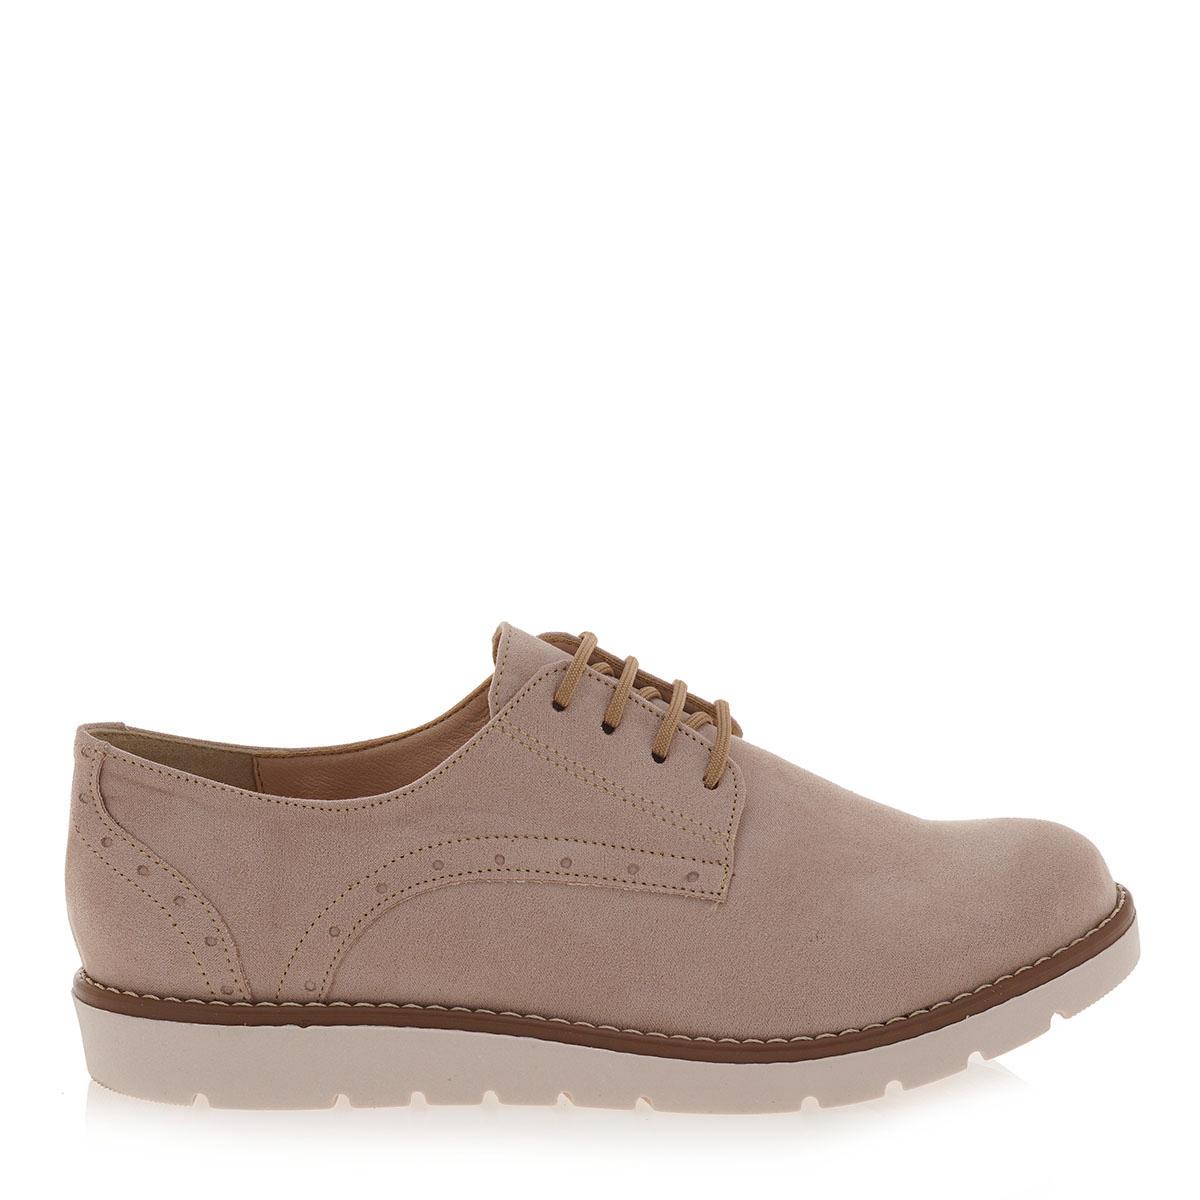 LACE-UP SHOES σχέδιο: I14175601 outlet   γυναικεια   lace up shoes